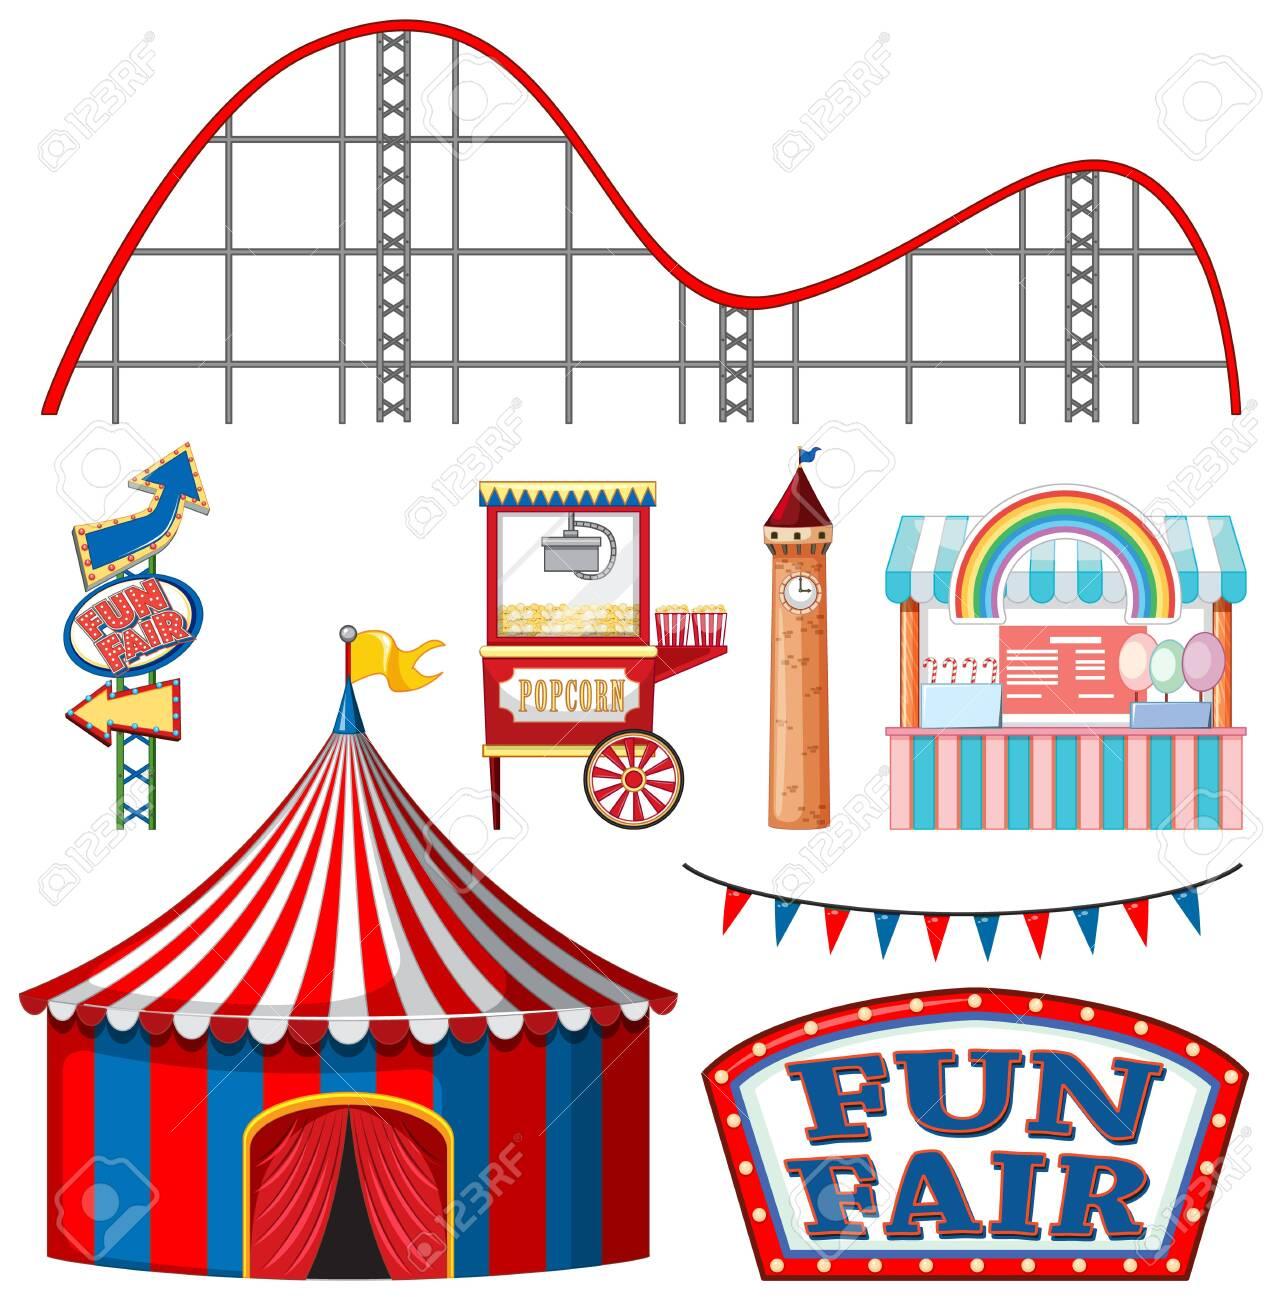 Set of circus items on white background illustration - 137931150